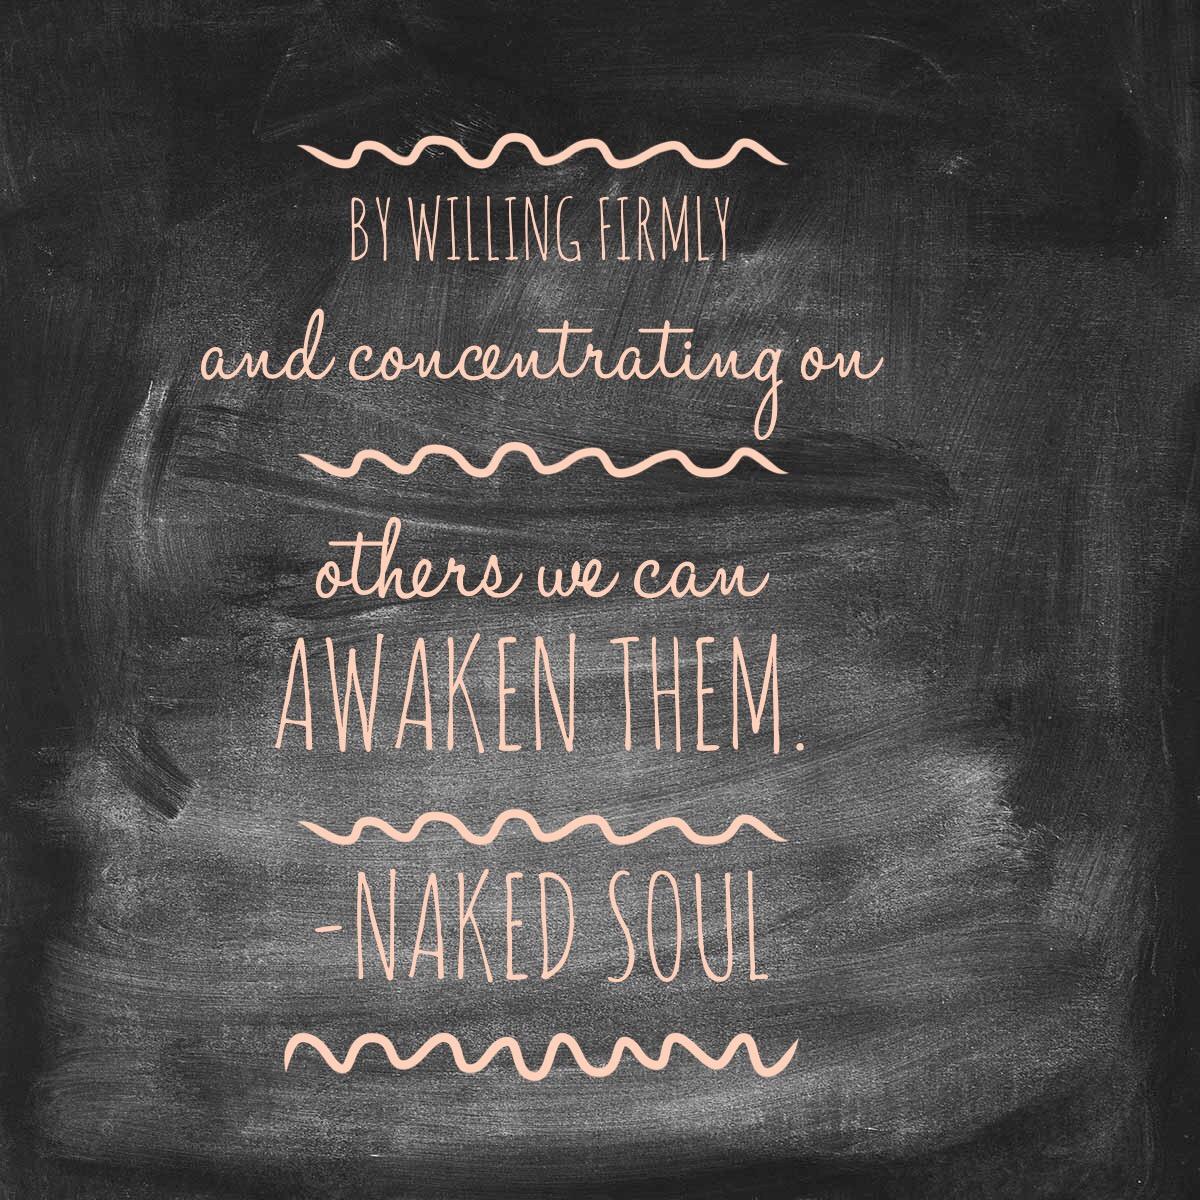 We can awaken them